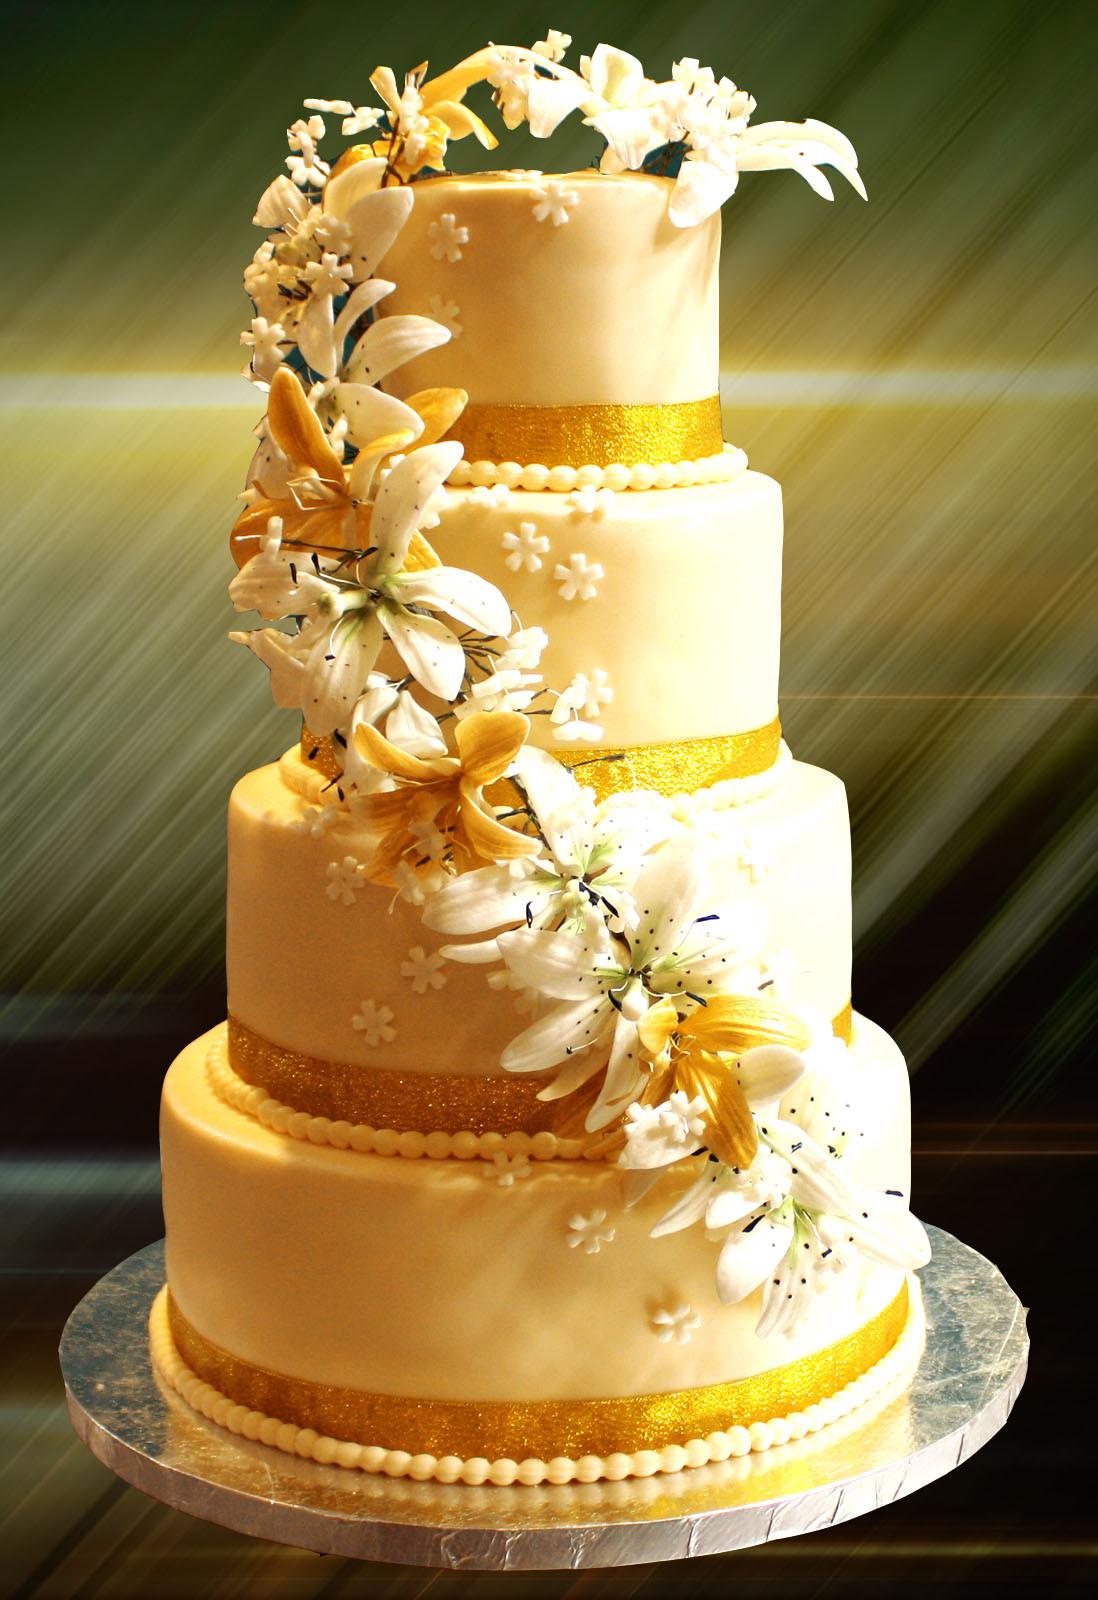 Wedding Birthday Cakes  wedding cake in Dubai